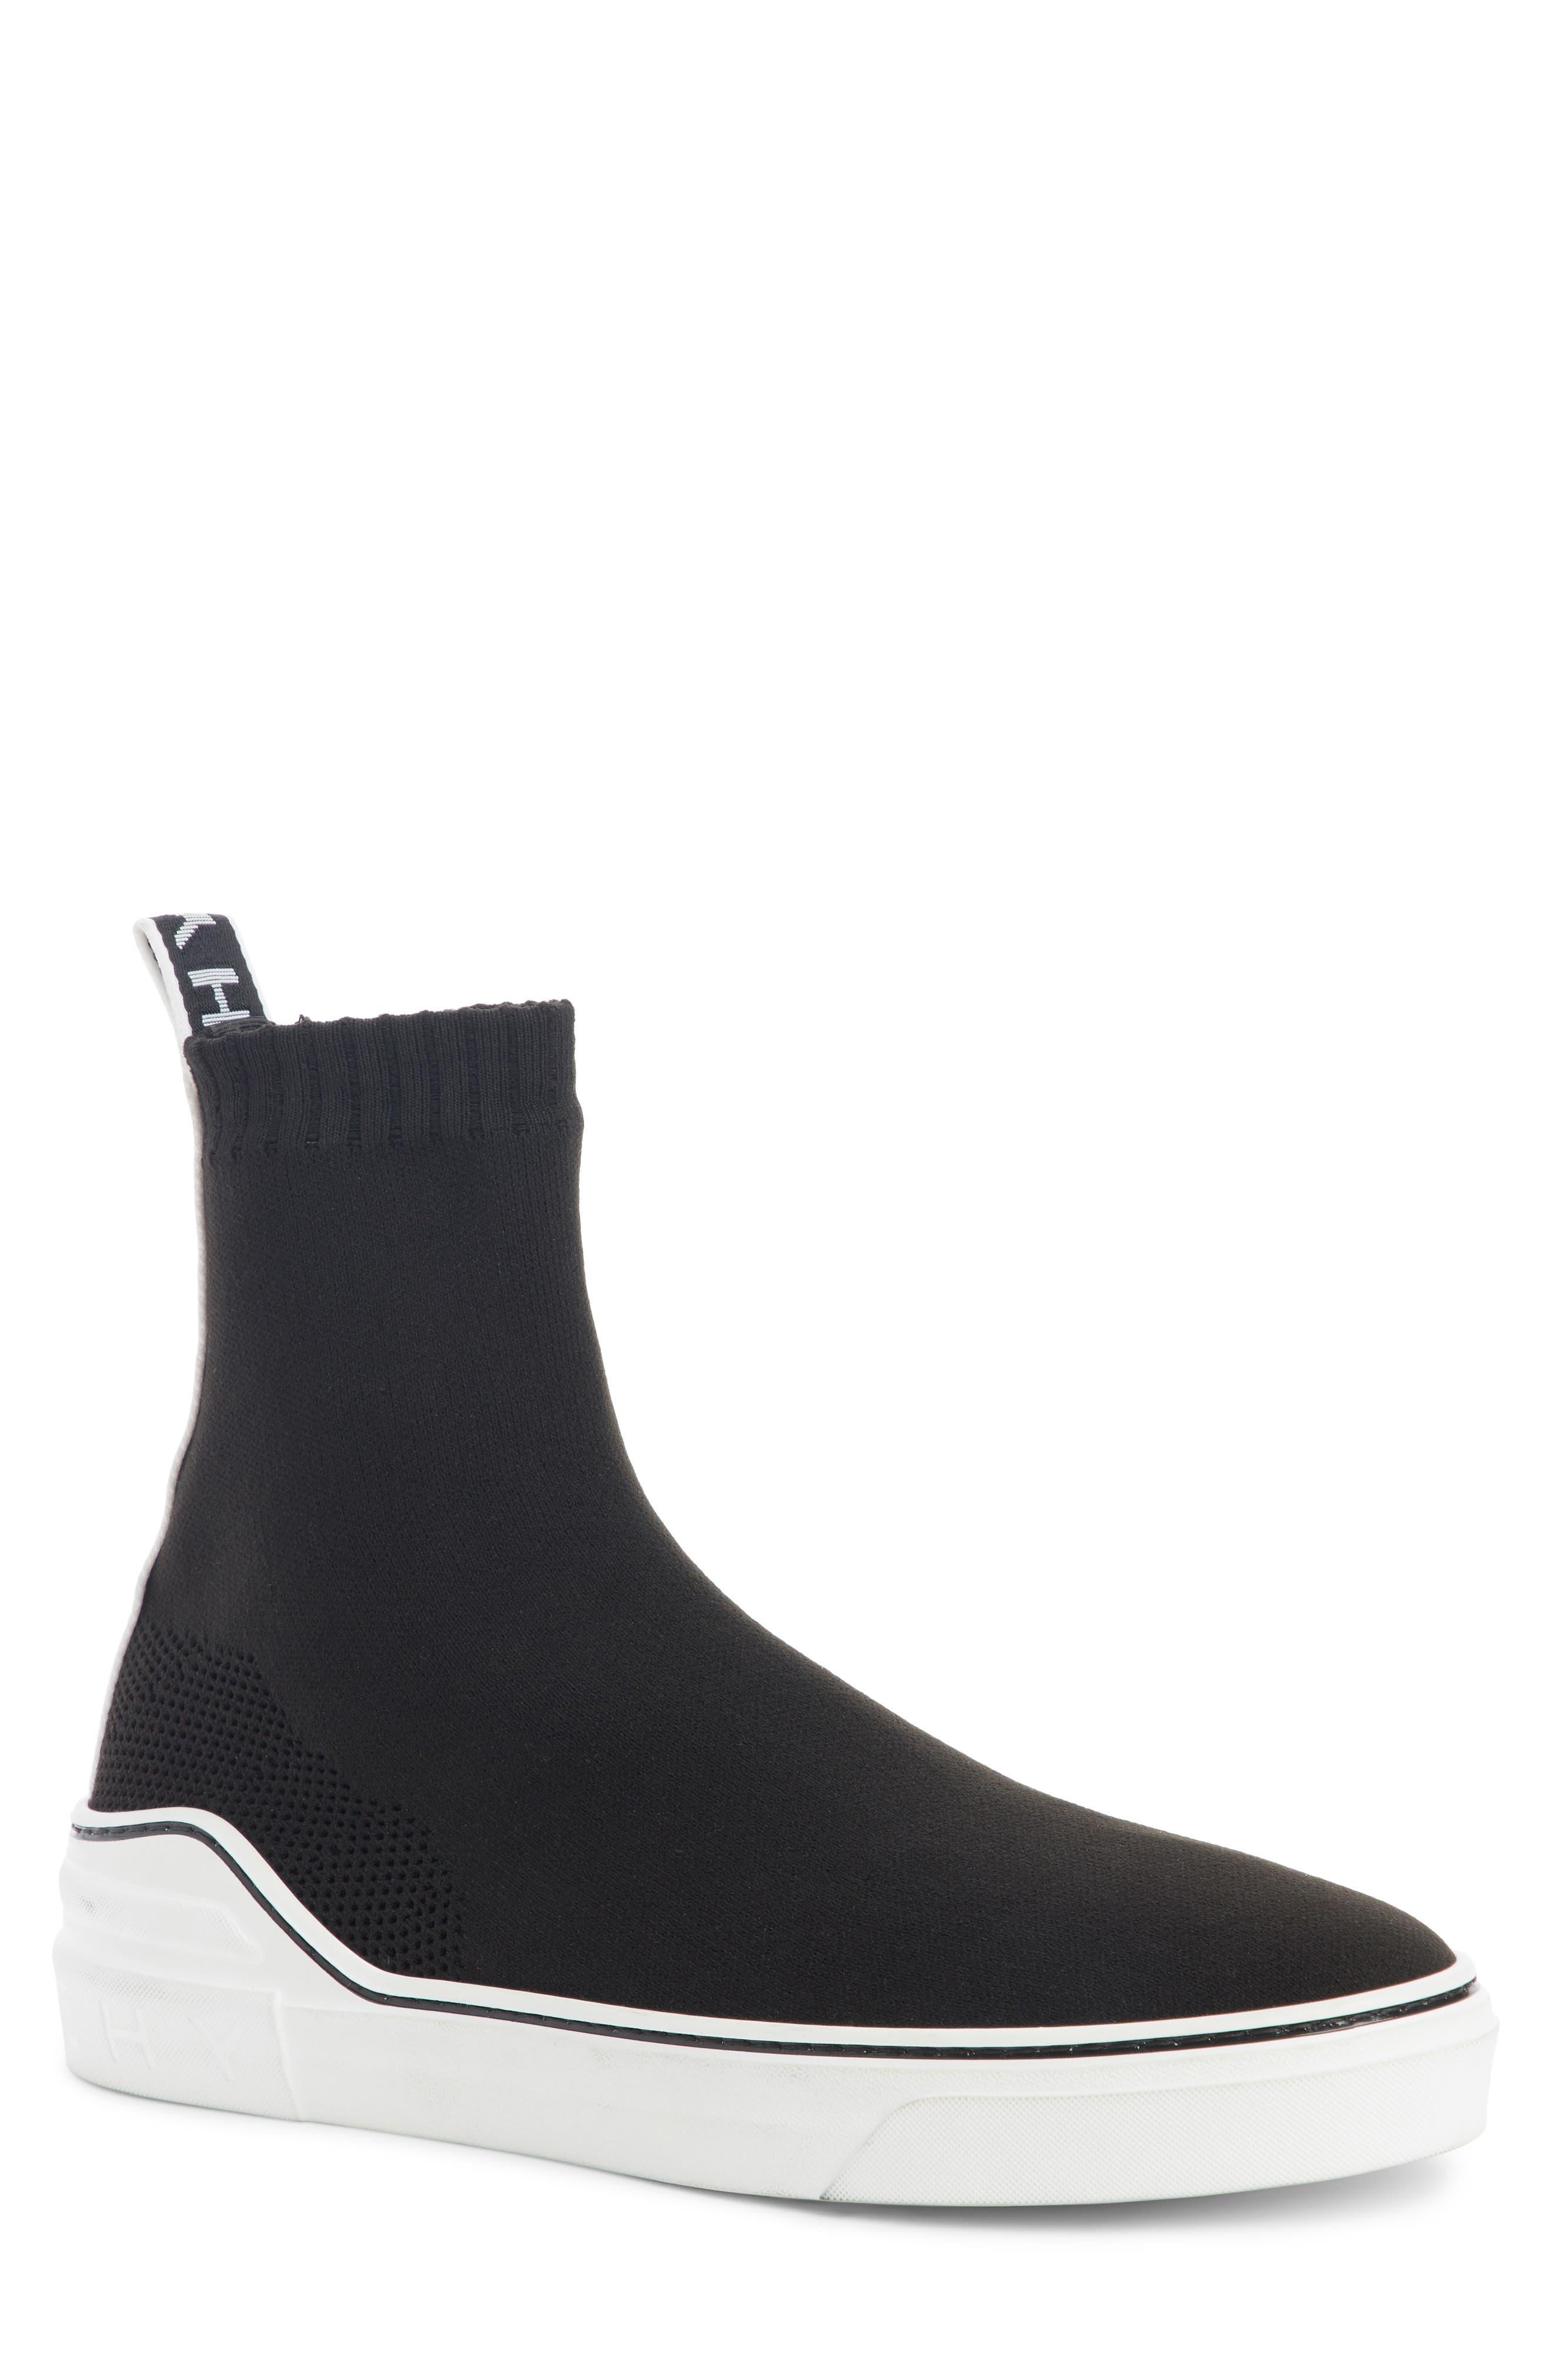 George V Hi Sock Sneaker,                         Main,                         color, 001